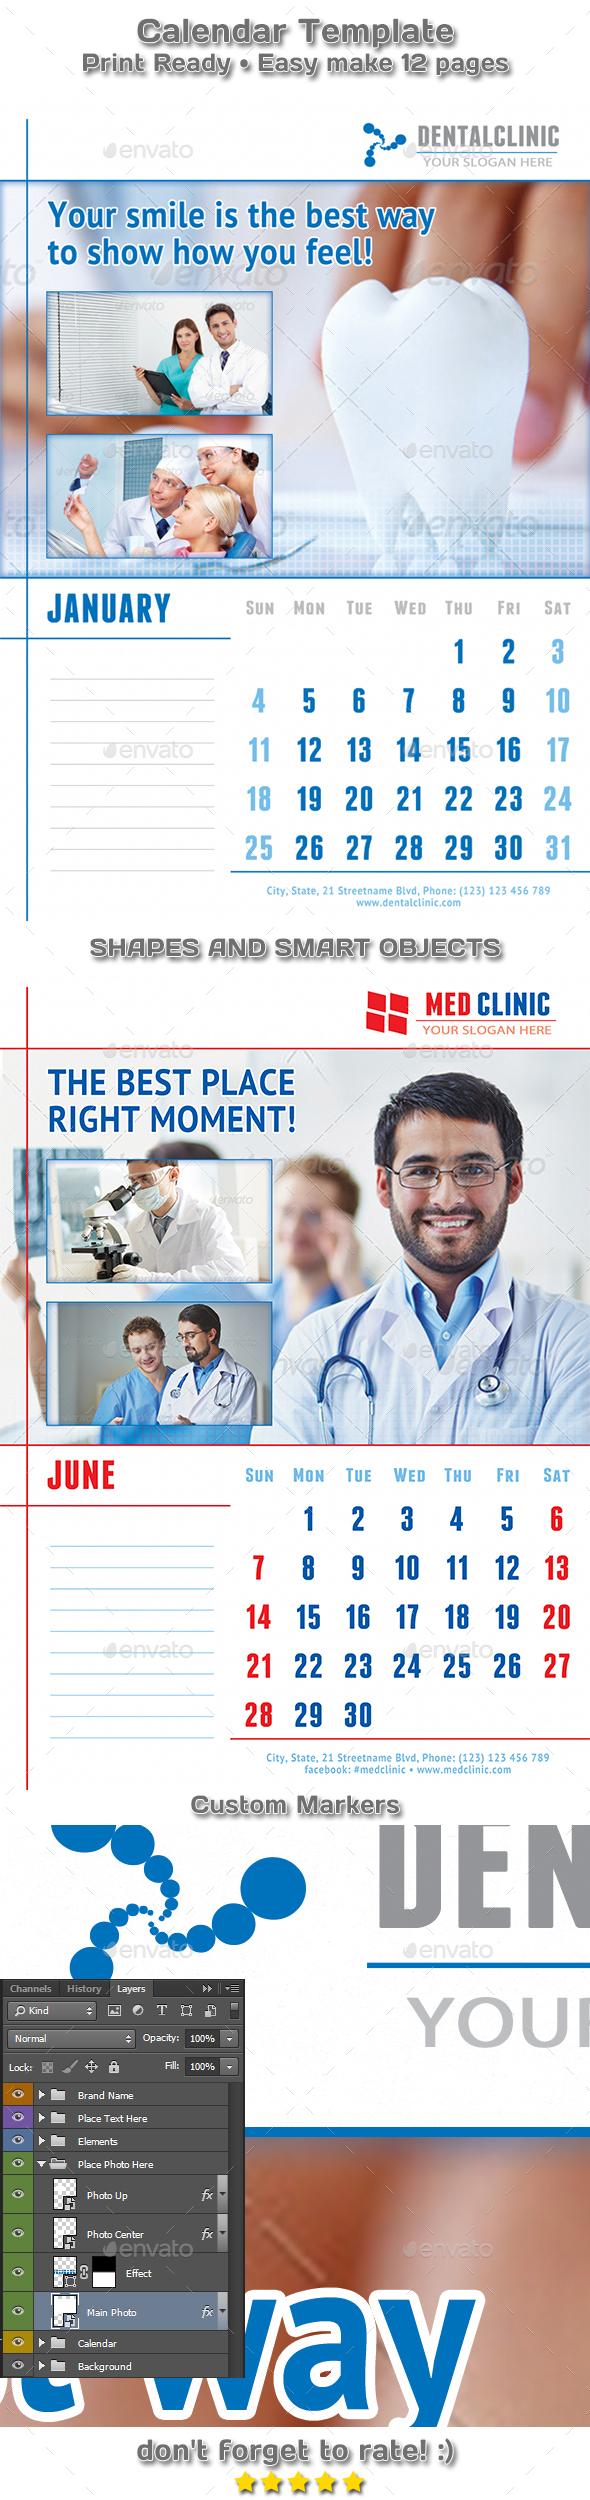 Medical or Dental Clinic Calendar 2018 Template - Calendars Stationery